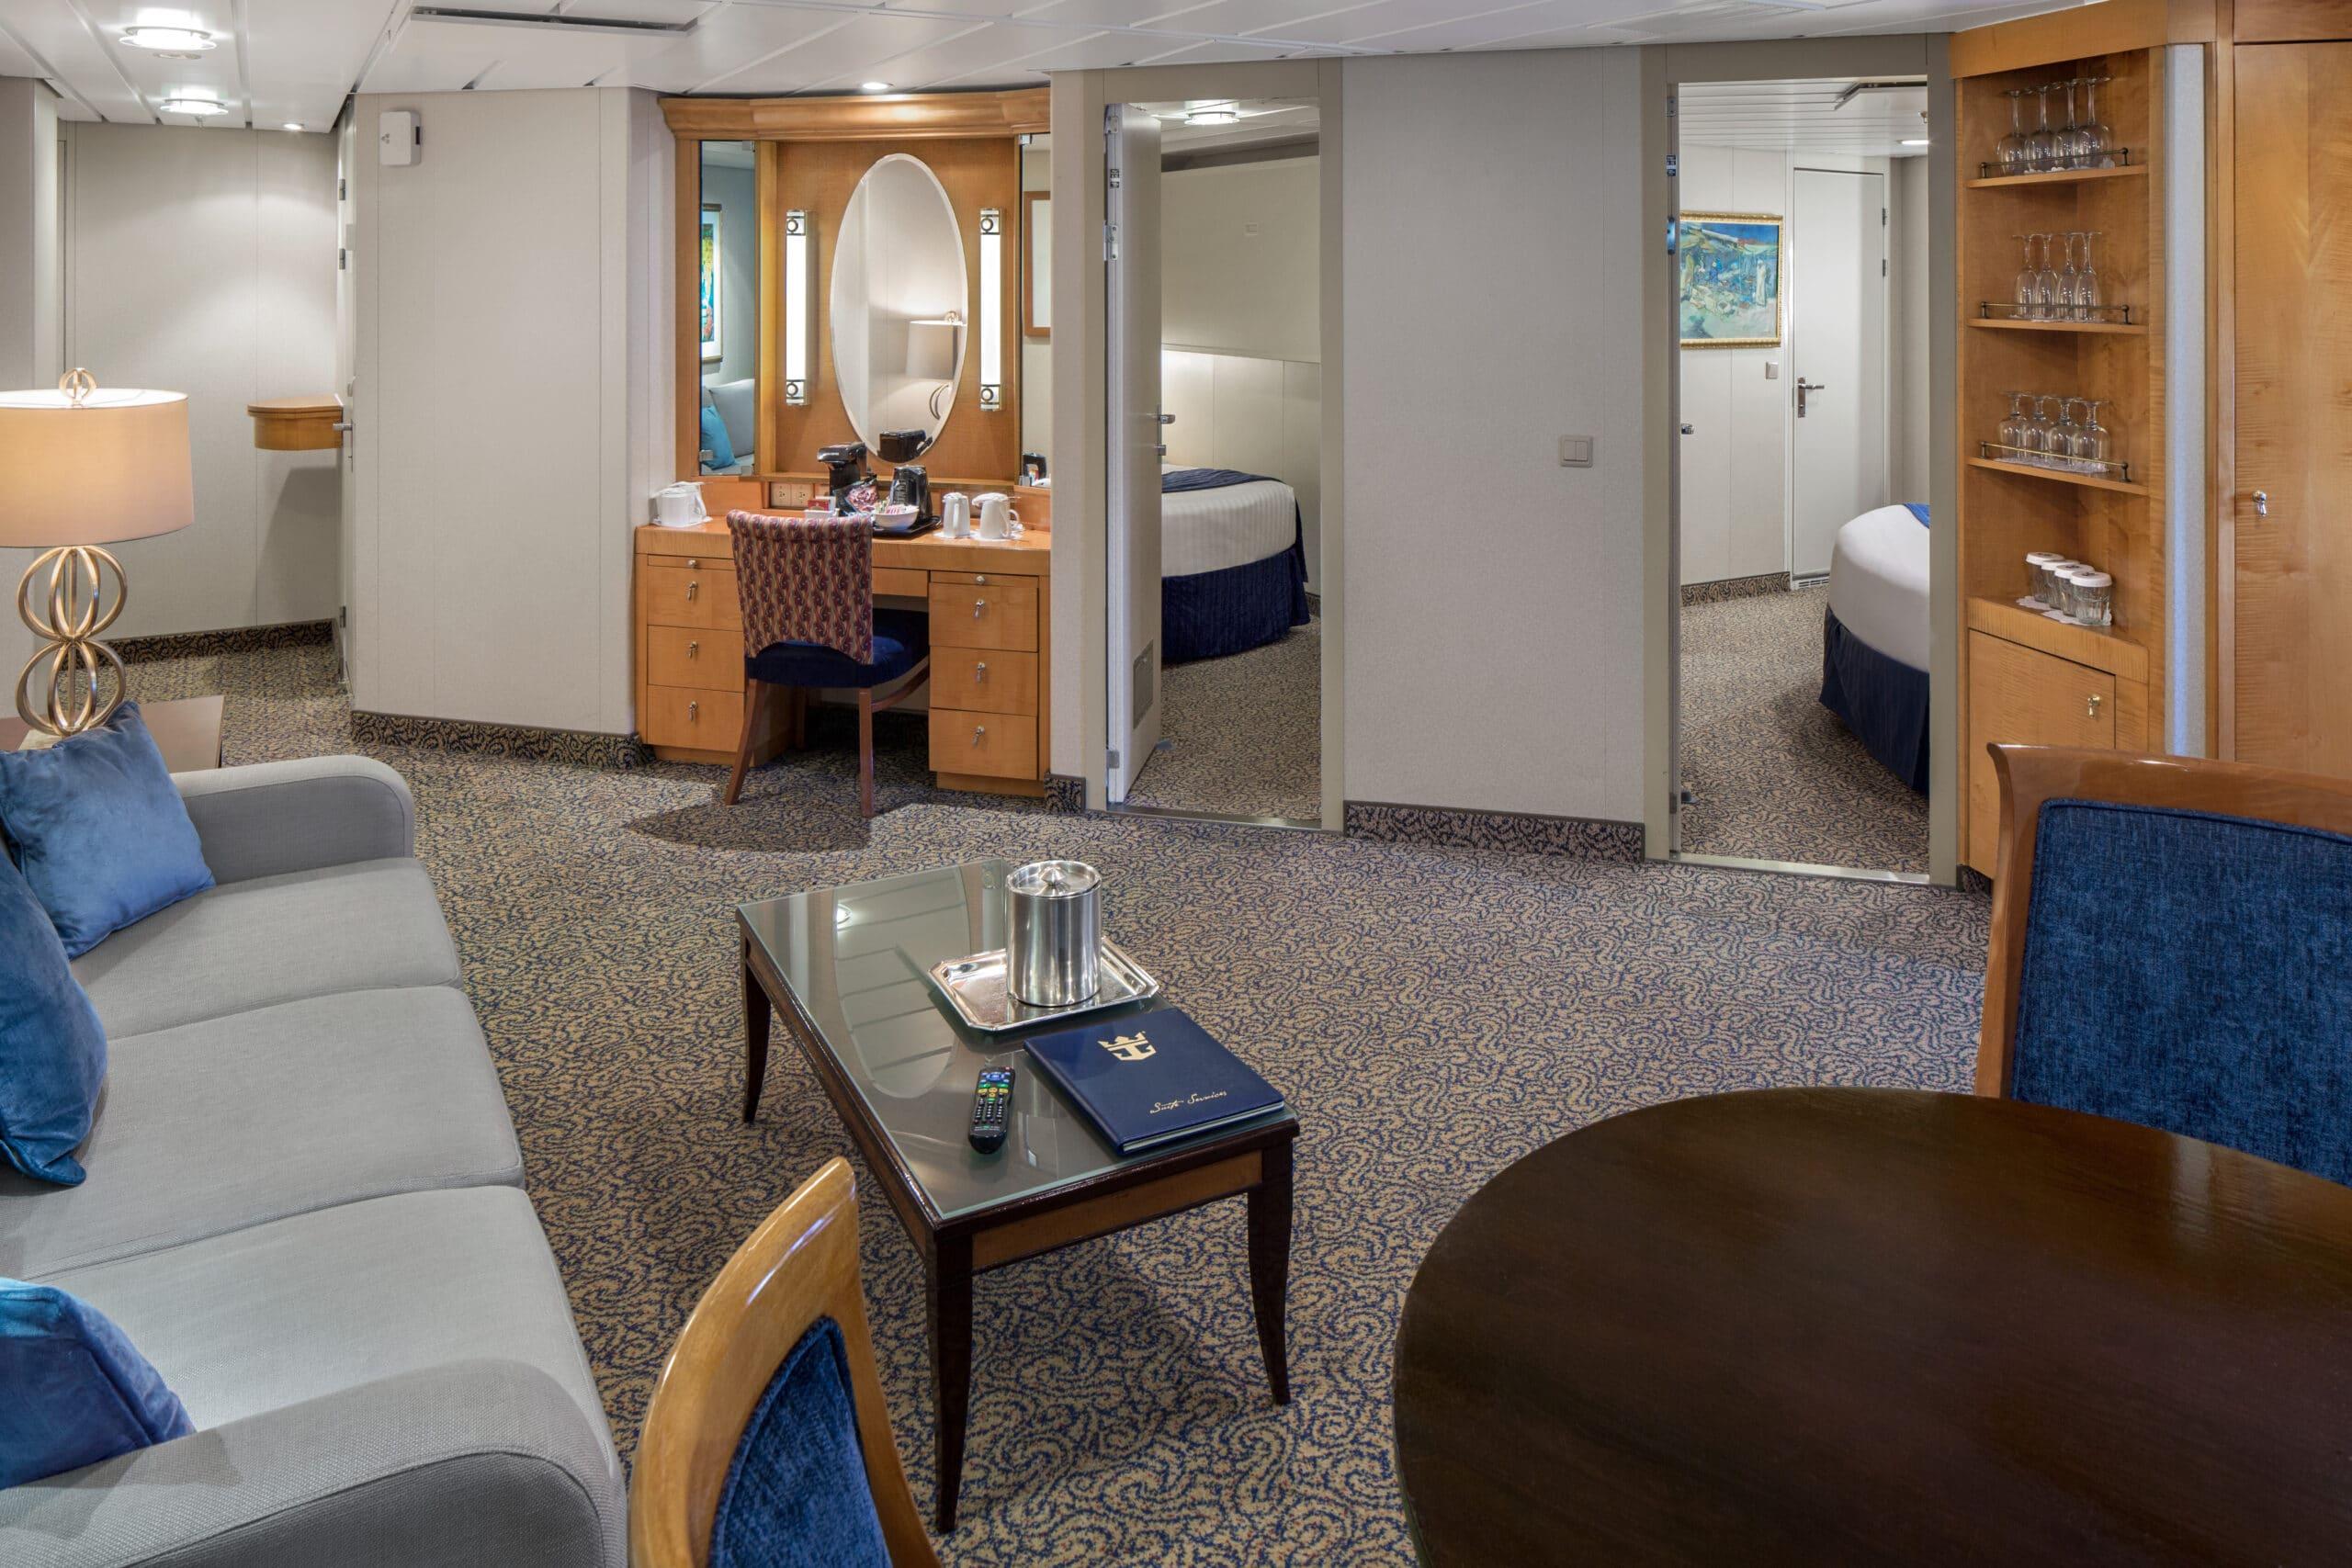 Royal-Caribbean-International-Radiance-of-the-Seas-schip-cruiseschip-categorie-OT-Owner-Suite-2-bedroom